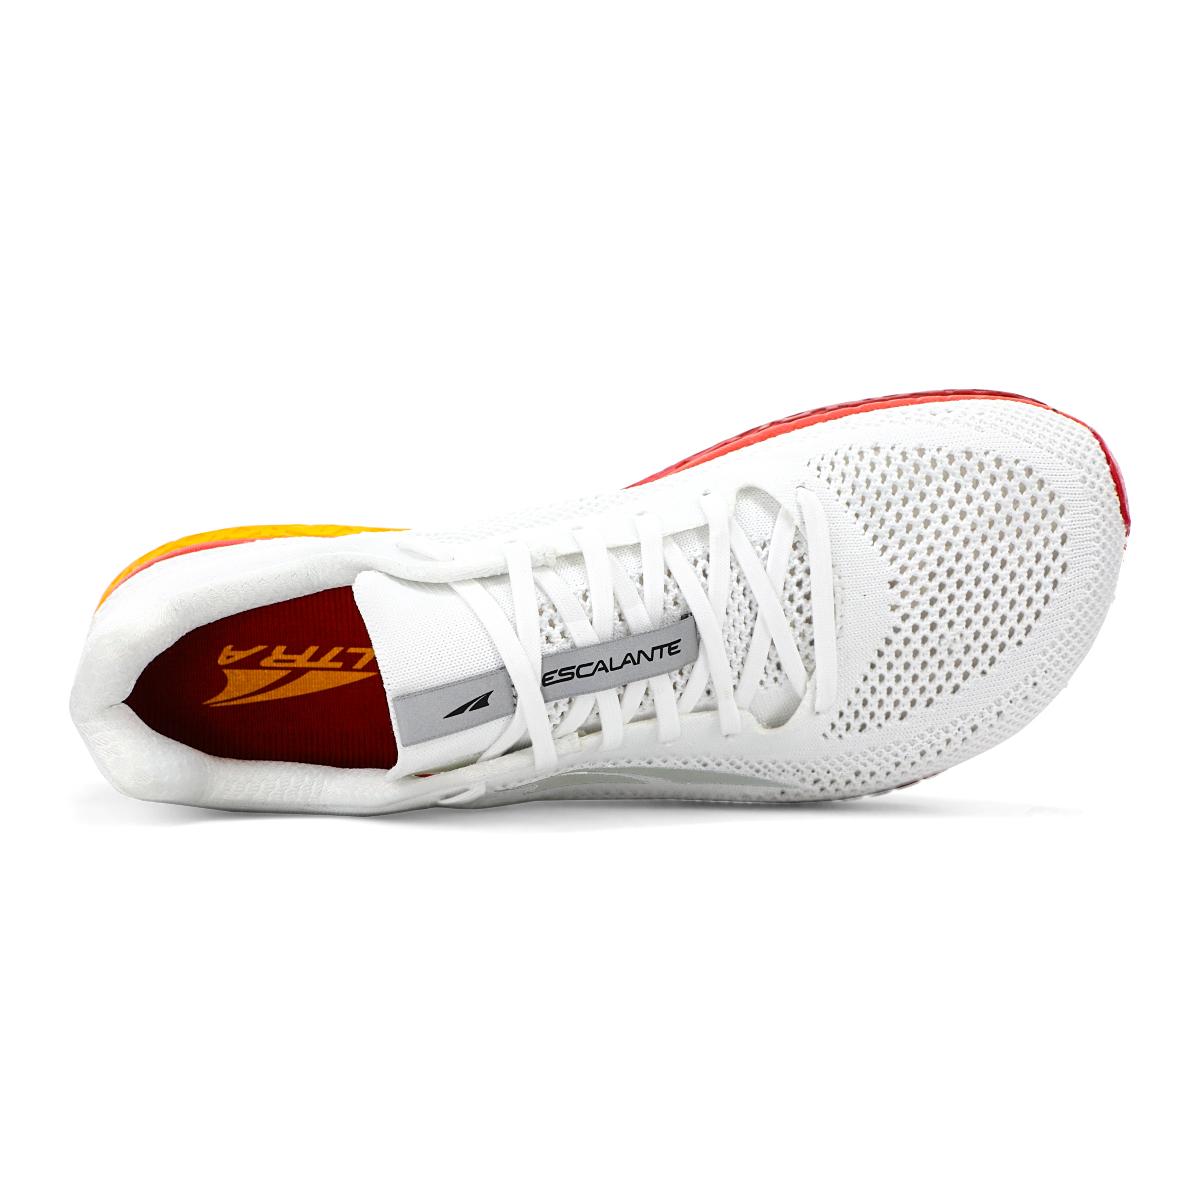 Men's Altra Escalante Racer Running Shoe - Color: White/Orange - Size: 7 - Width: Regular, White/Orange, large, image 4